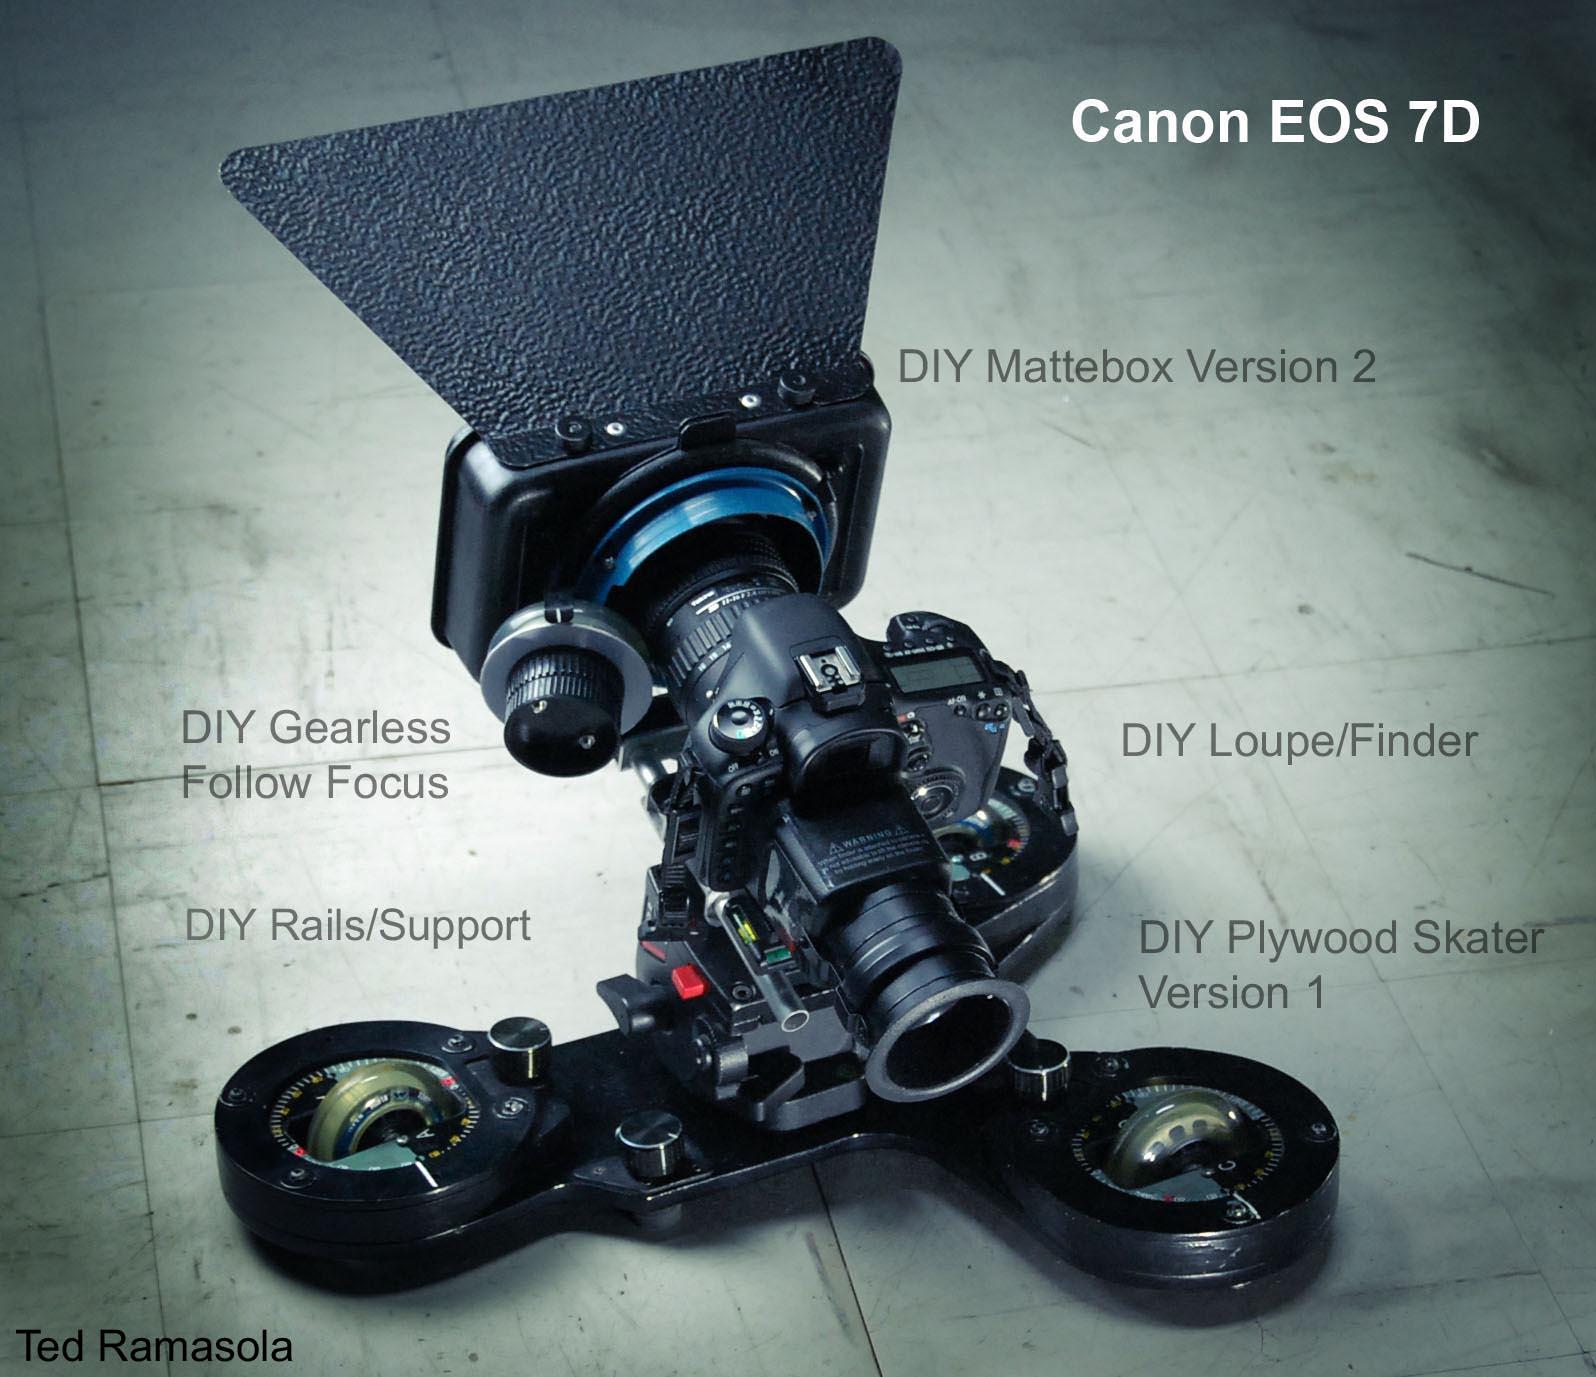 Diy Dslr Camera Rig: Canon 7D *Official* DSLR Rigs & Discussion ~Post Your Pics